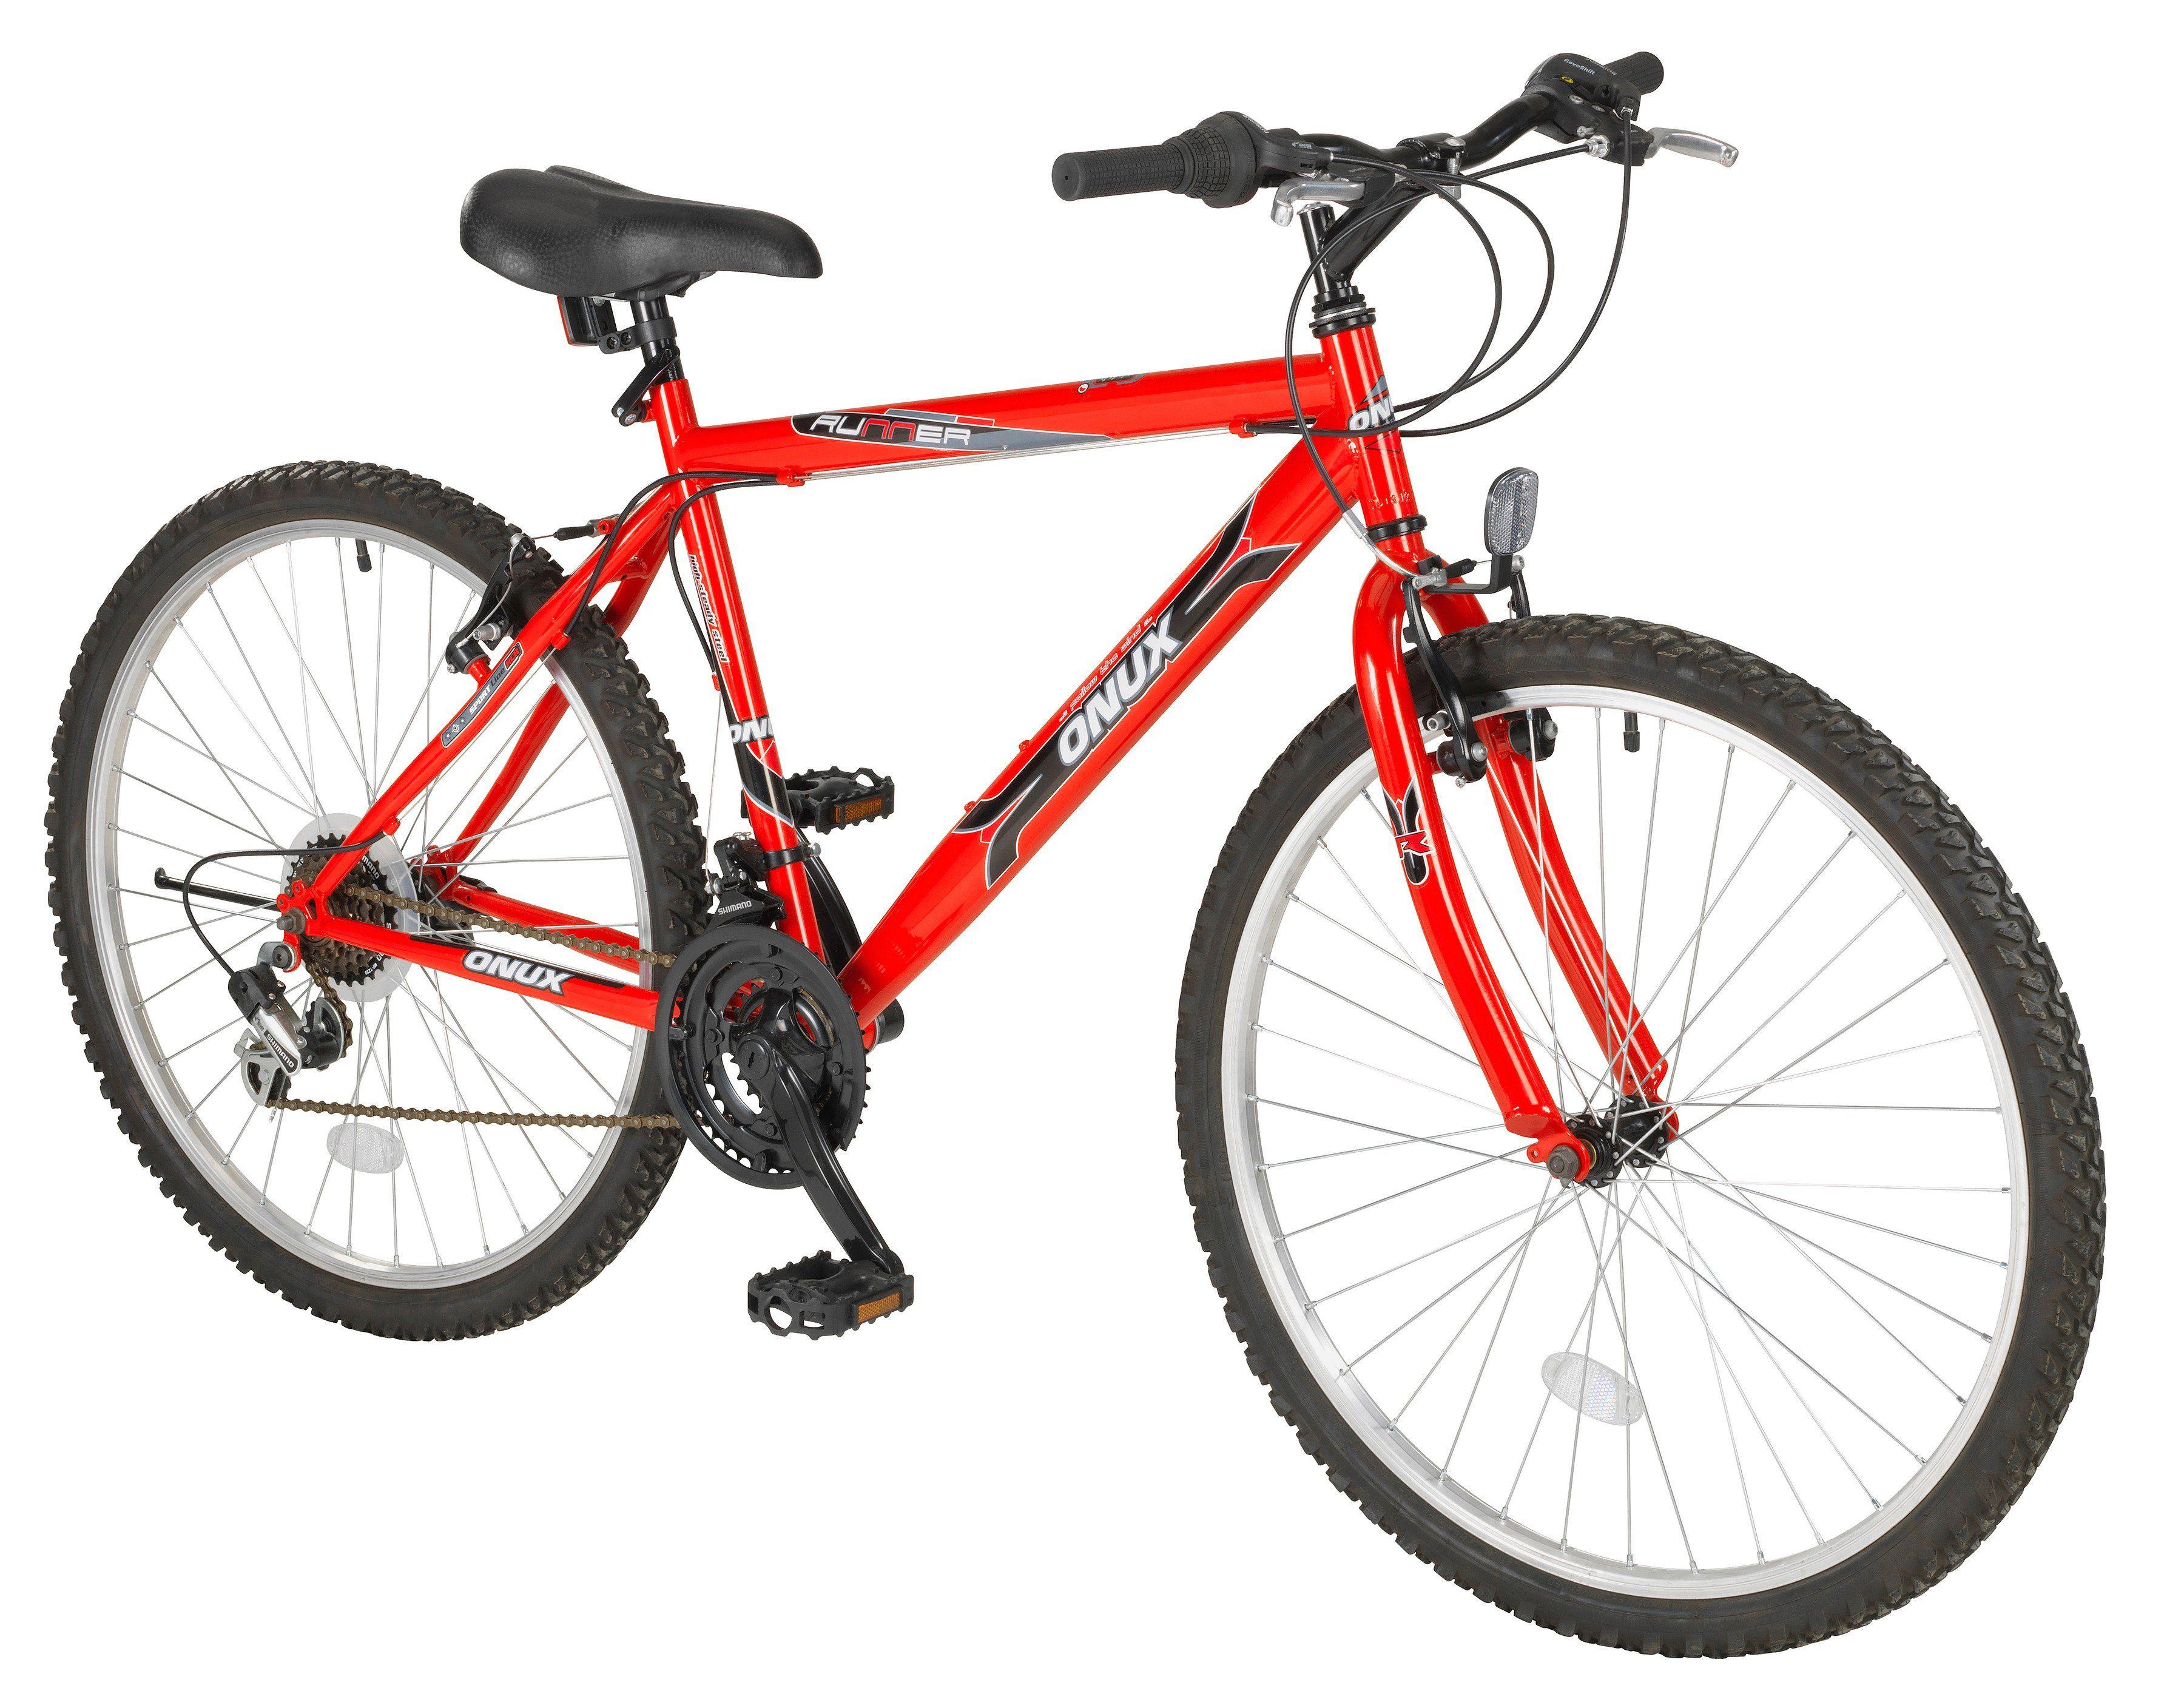 "Mountainbike (Herren) »""Cruzader"", 66,04 cm (26 Zoll)«"